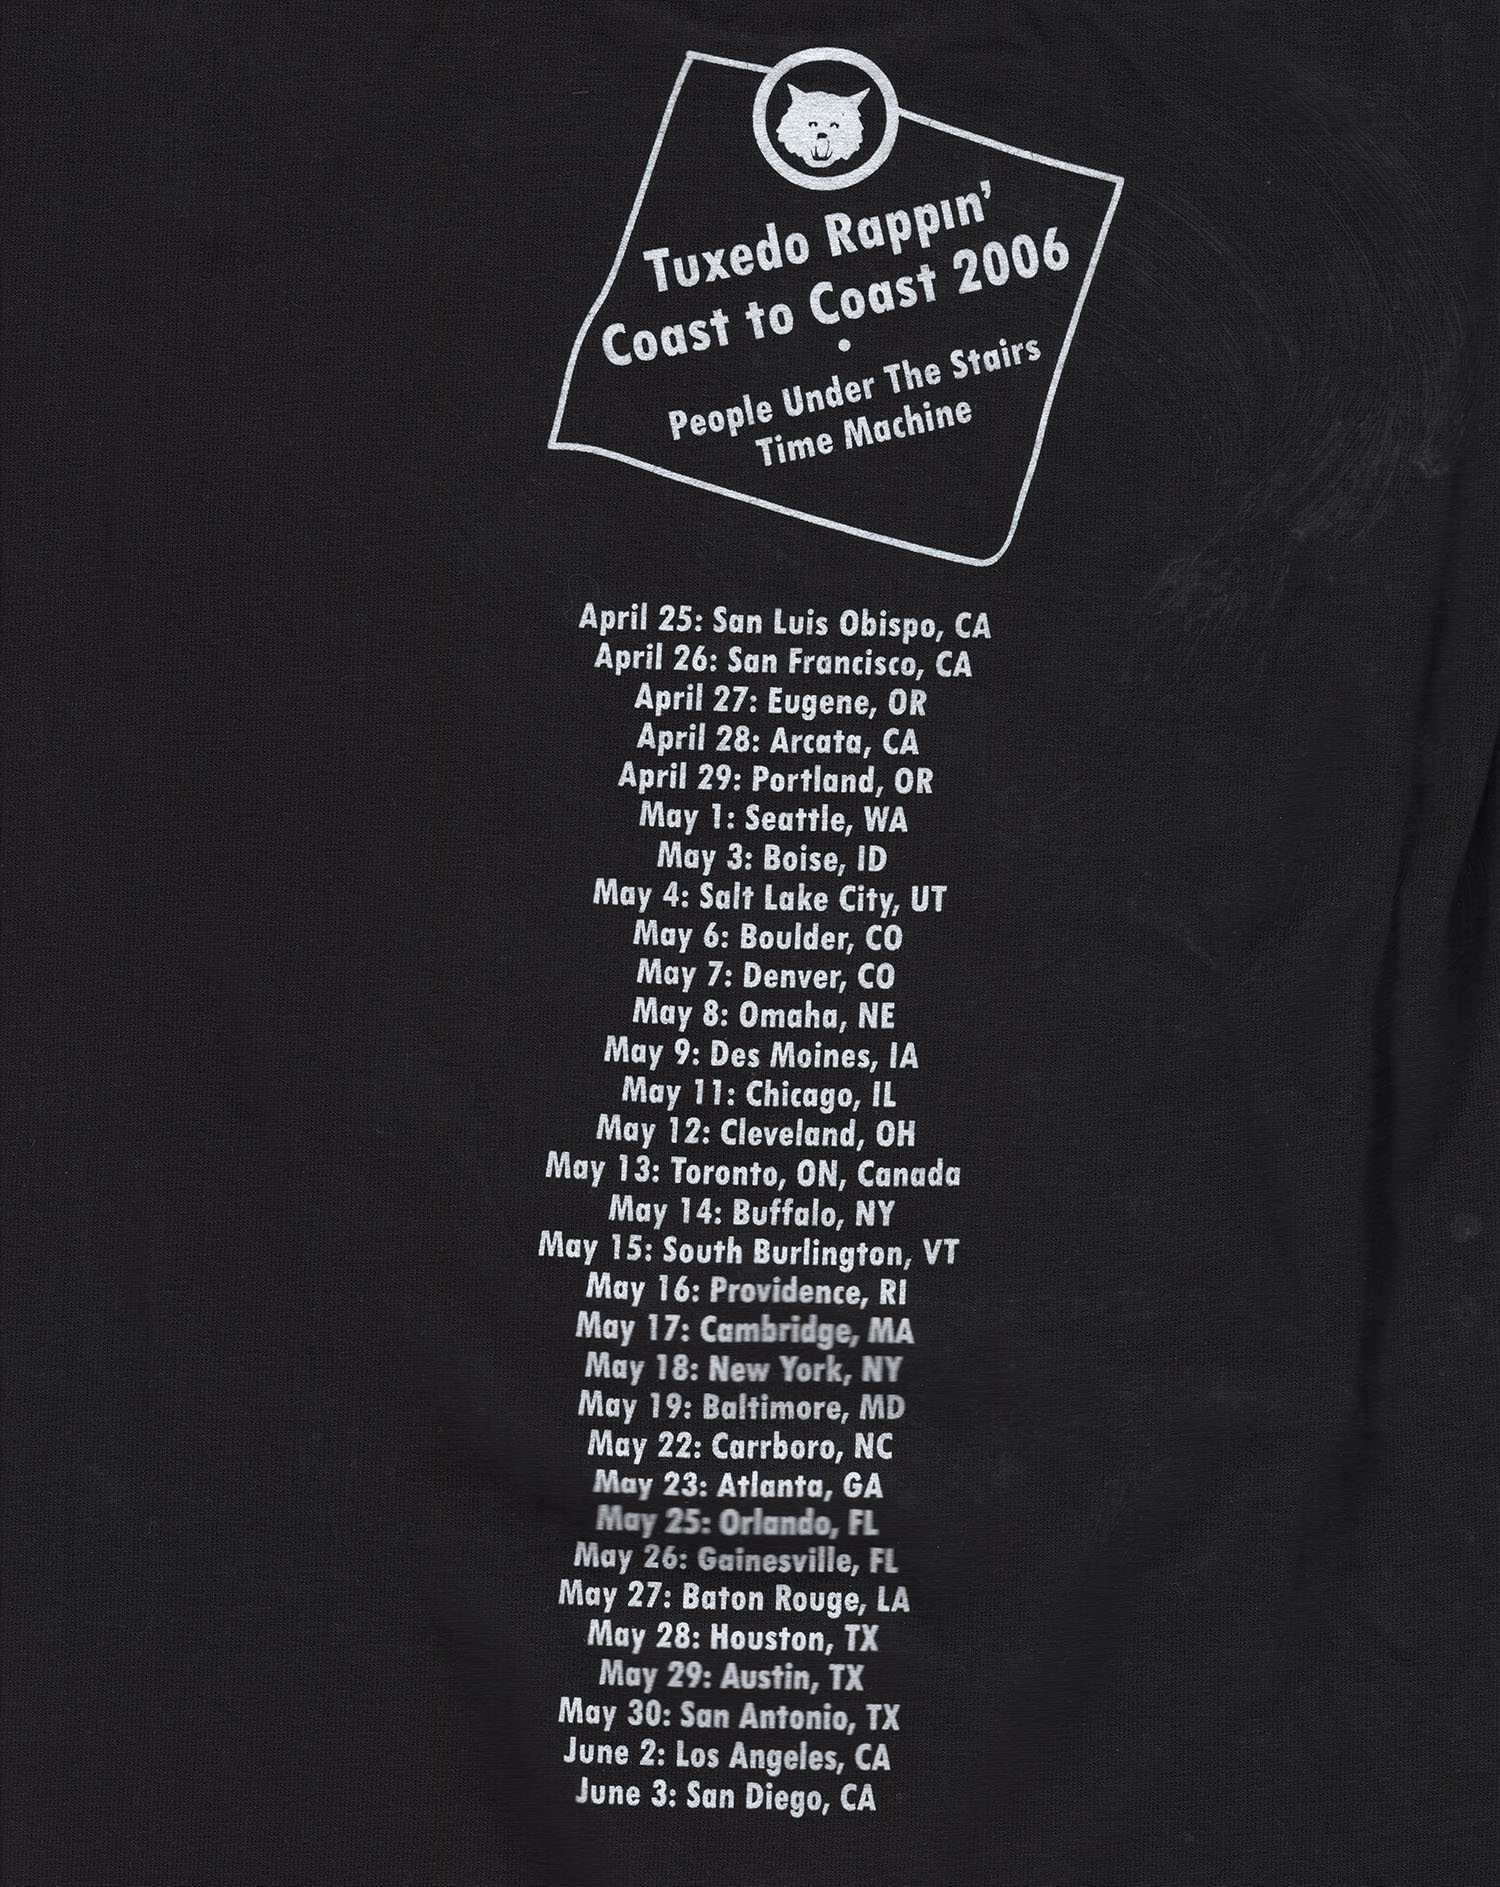 31 City USA Tour